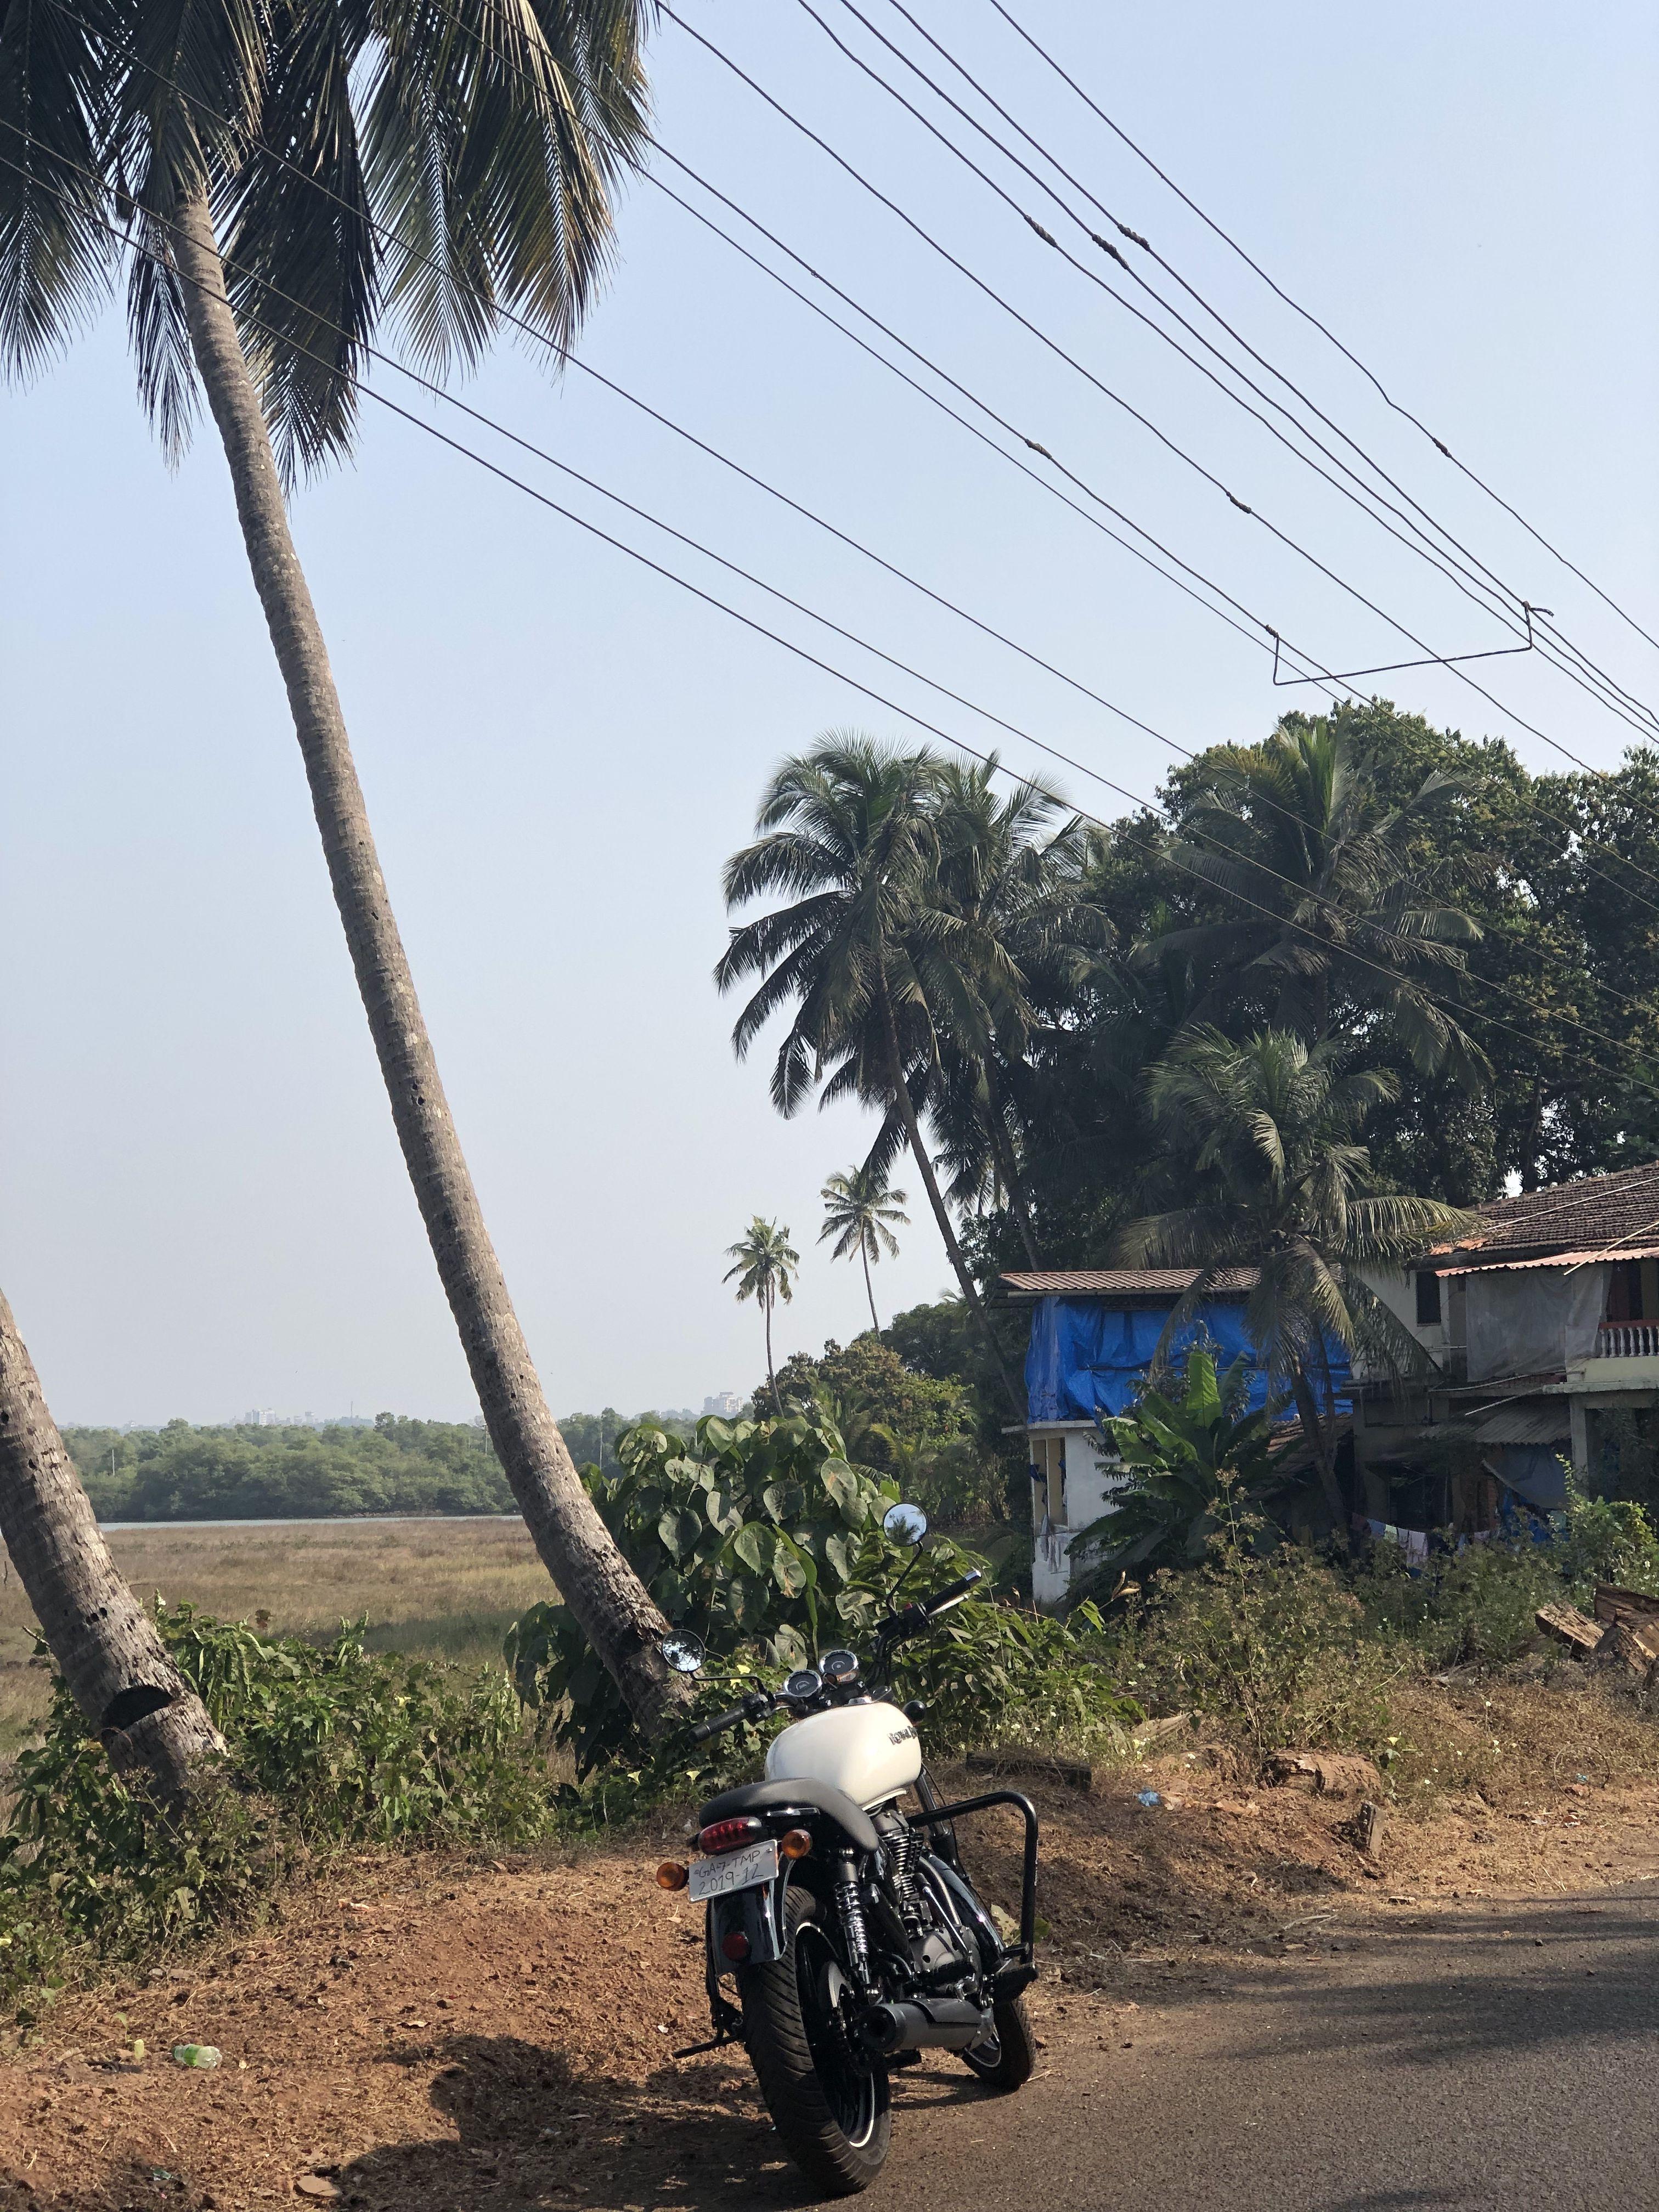 Goa rides #thunderbirdx #goalife #goaindia